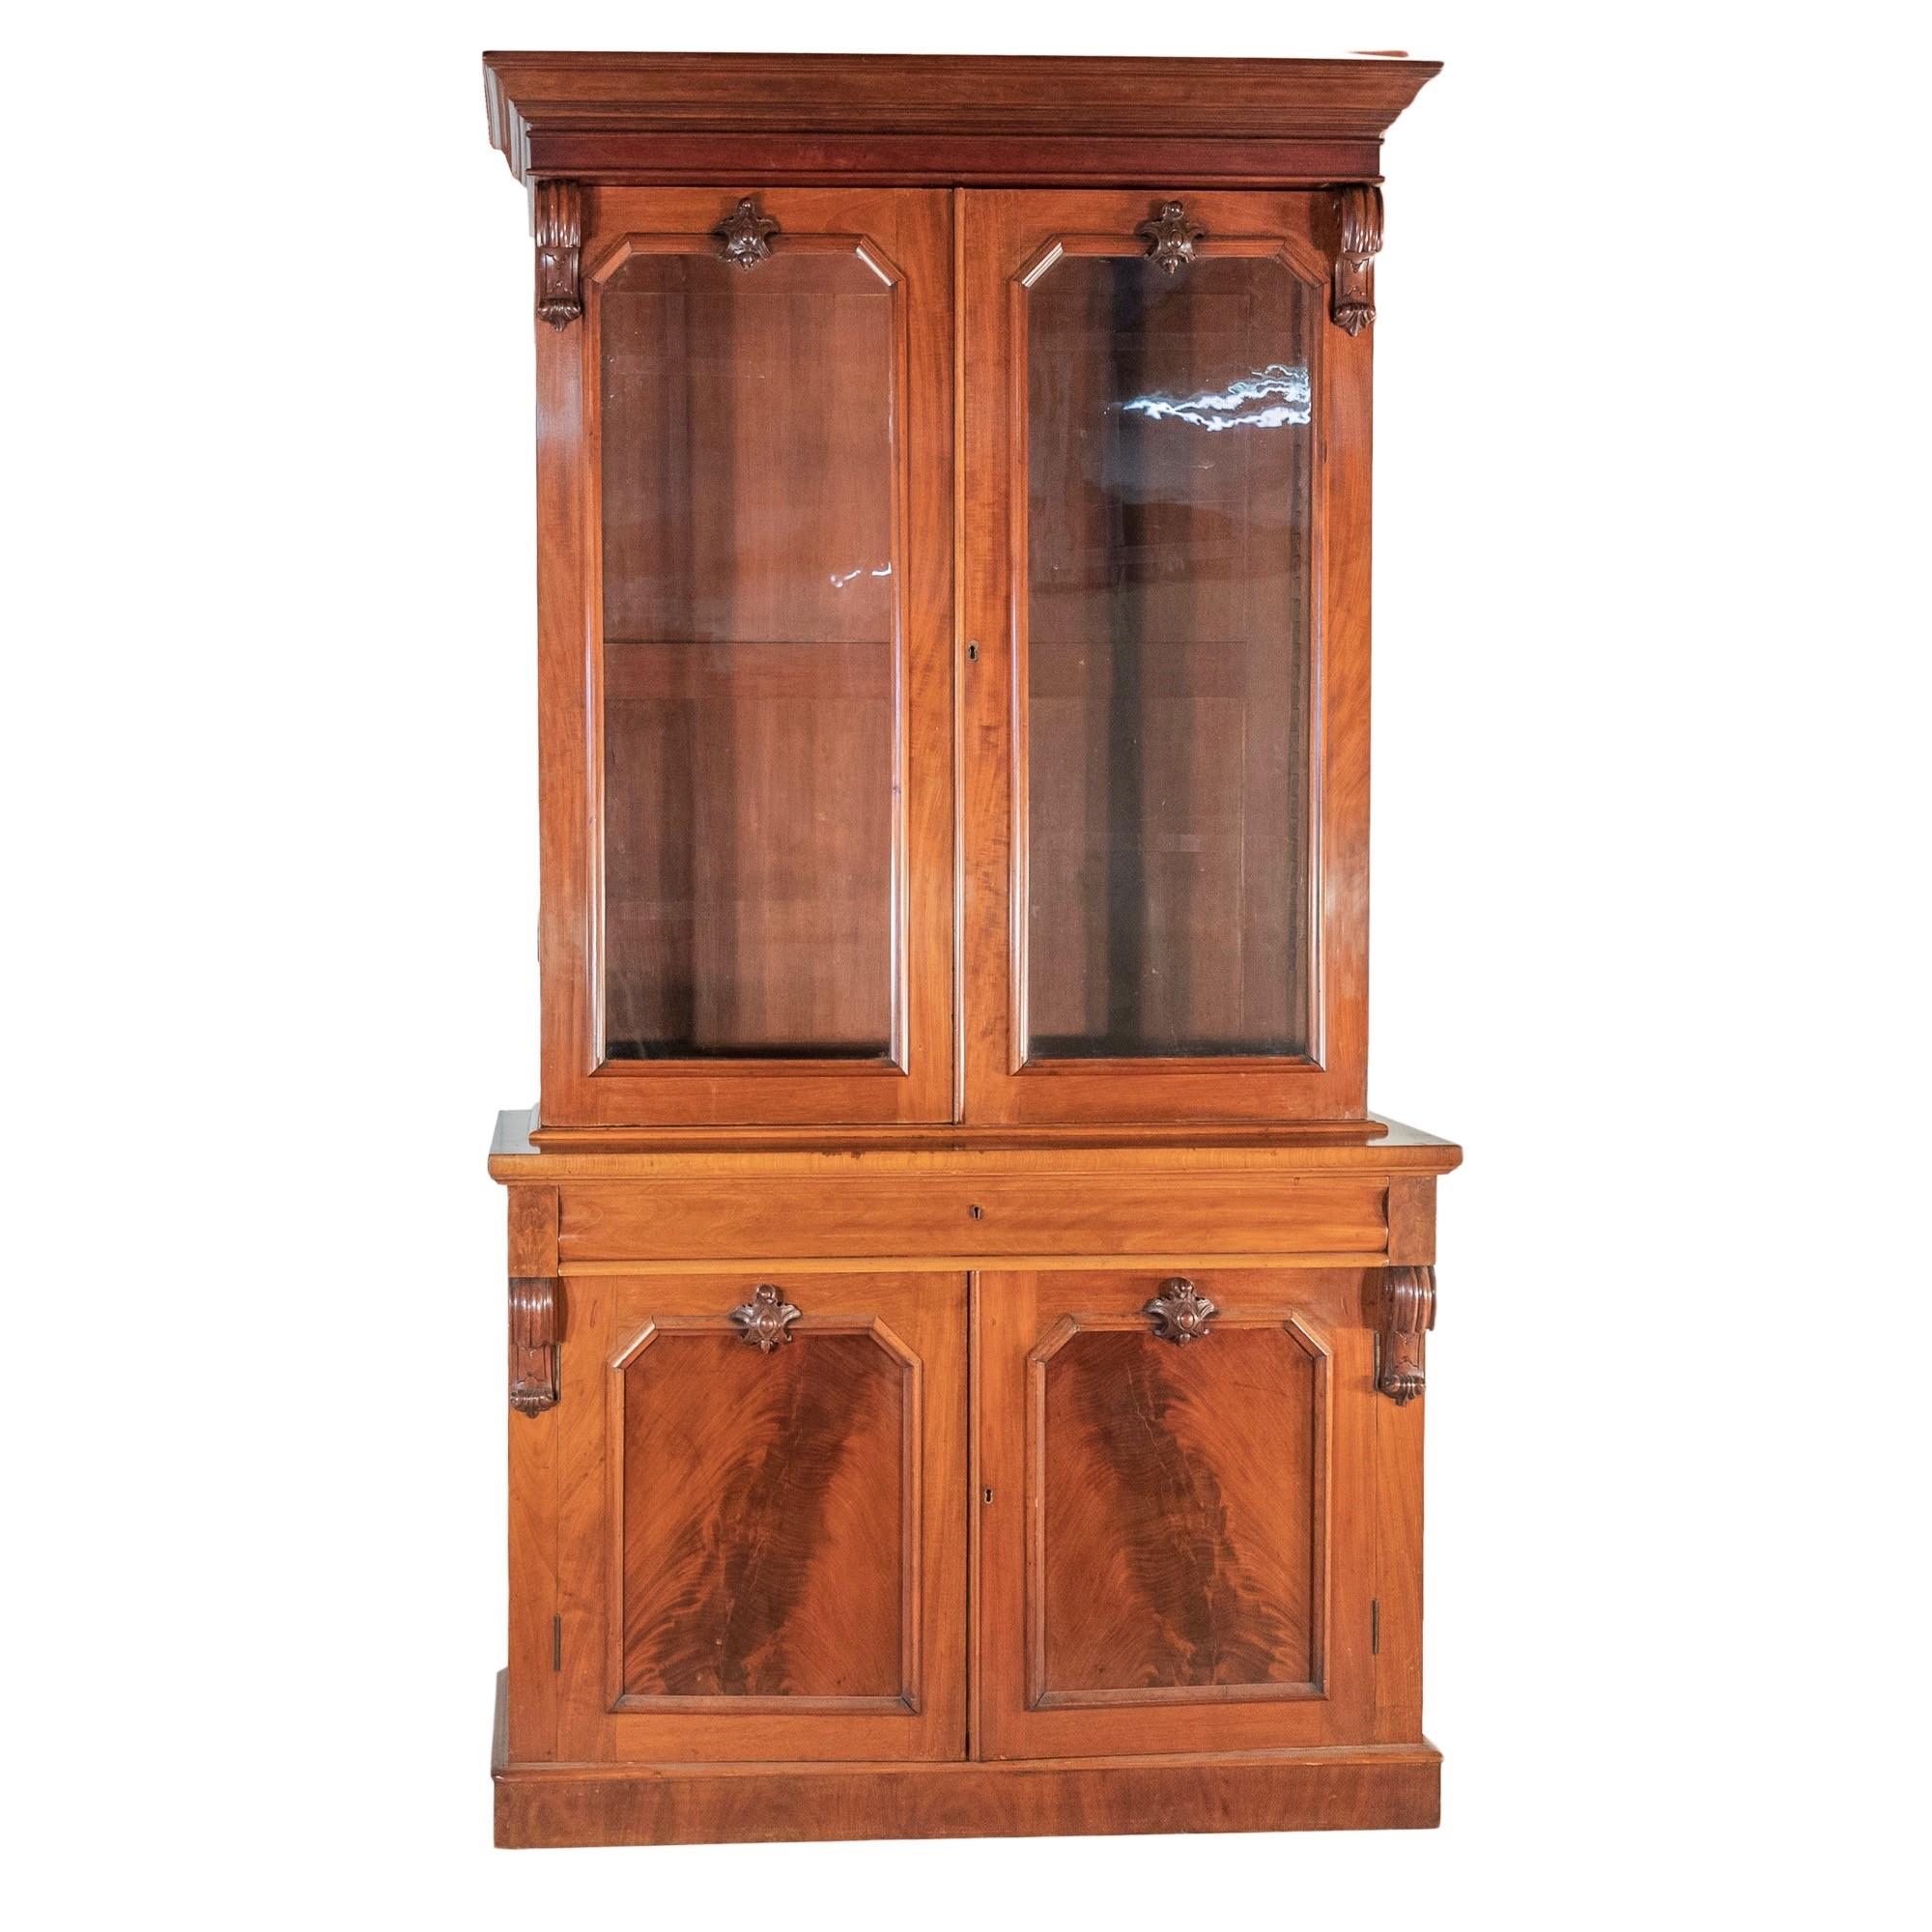 'Victorian Mahogany Bookcase Circa 1880'